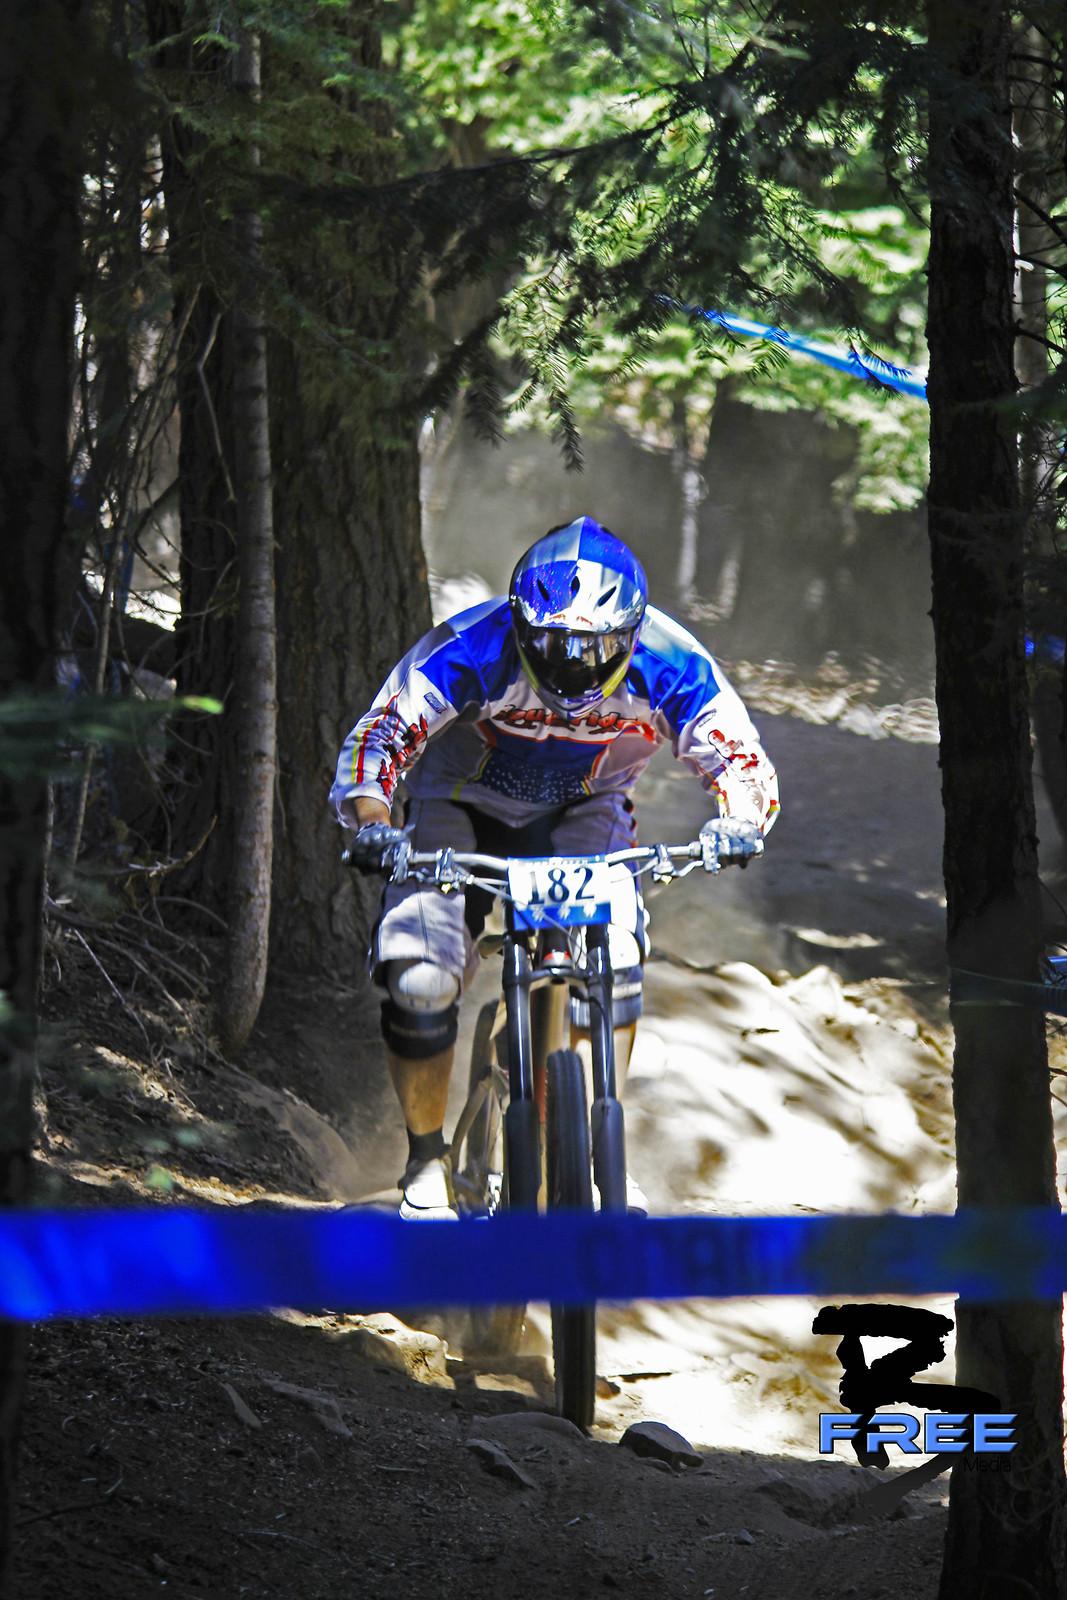 done4 1 - GnarHuck - Mountain Biking Pictures - Vital MTB